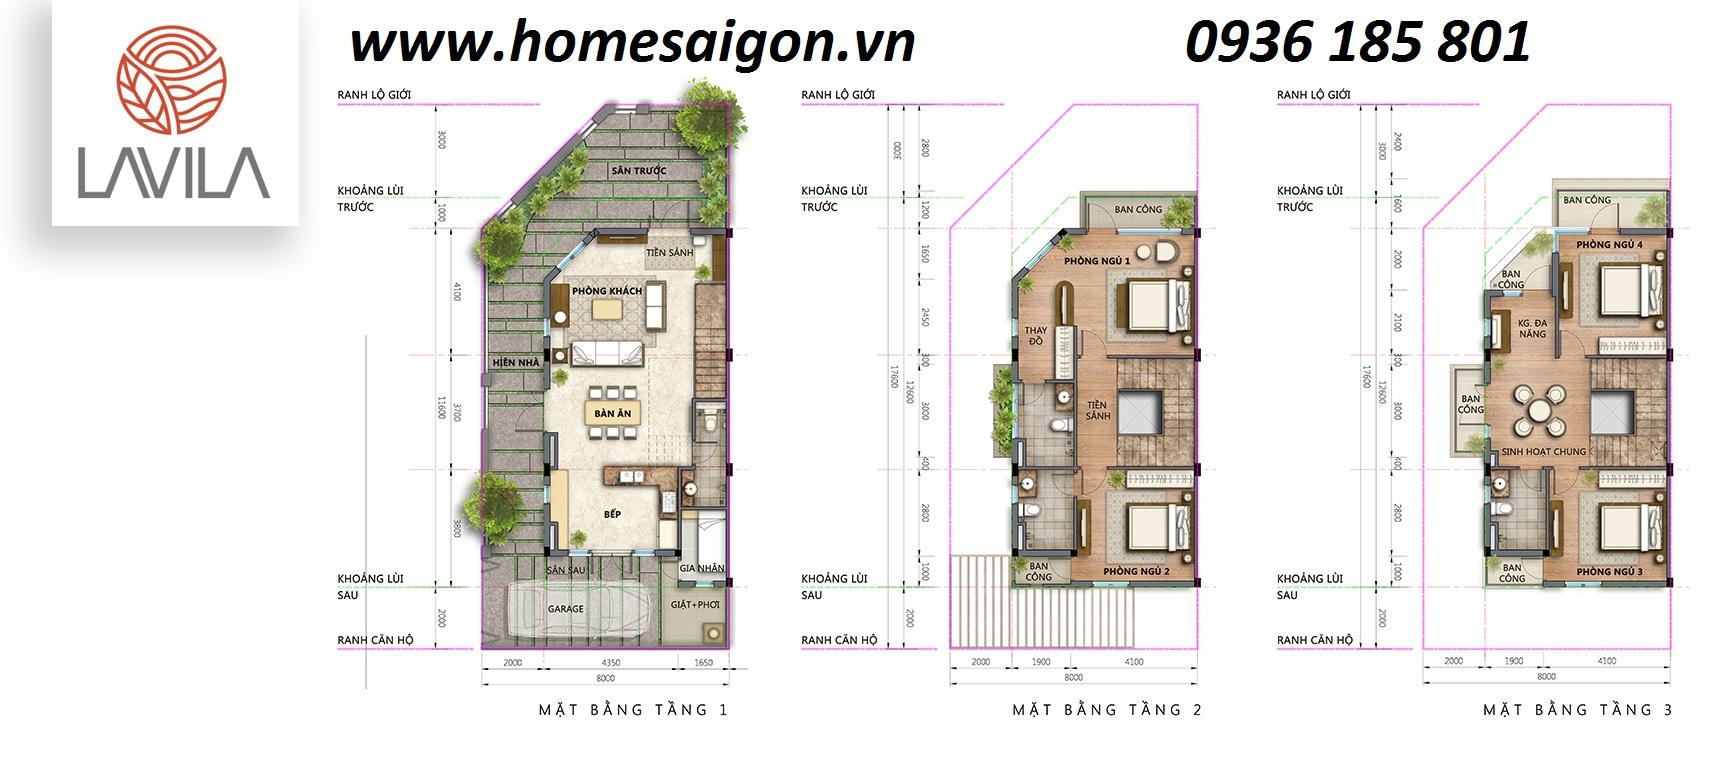 Mặt bằng căn góc dự án Lavila Kiến Á